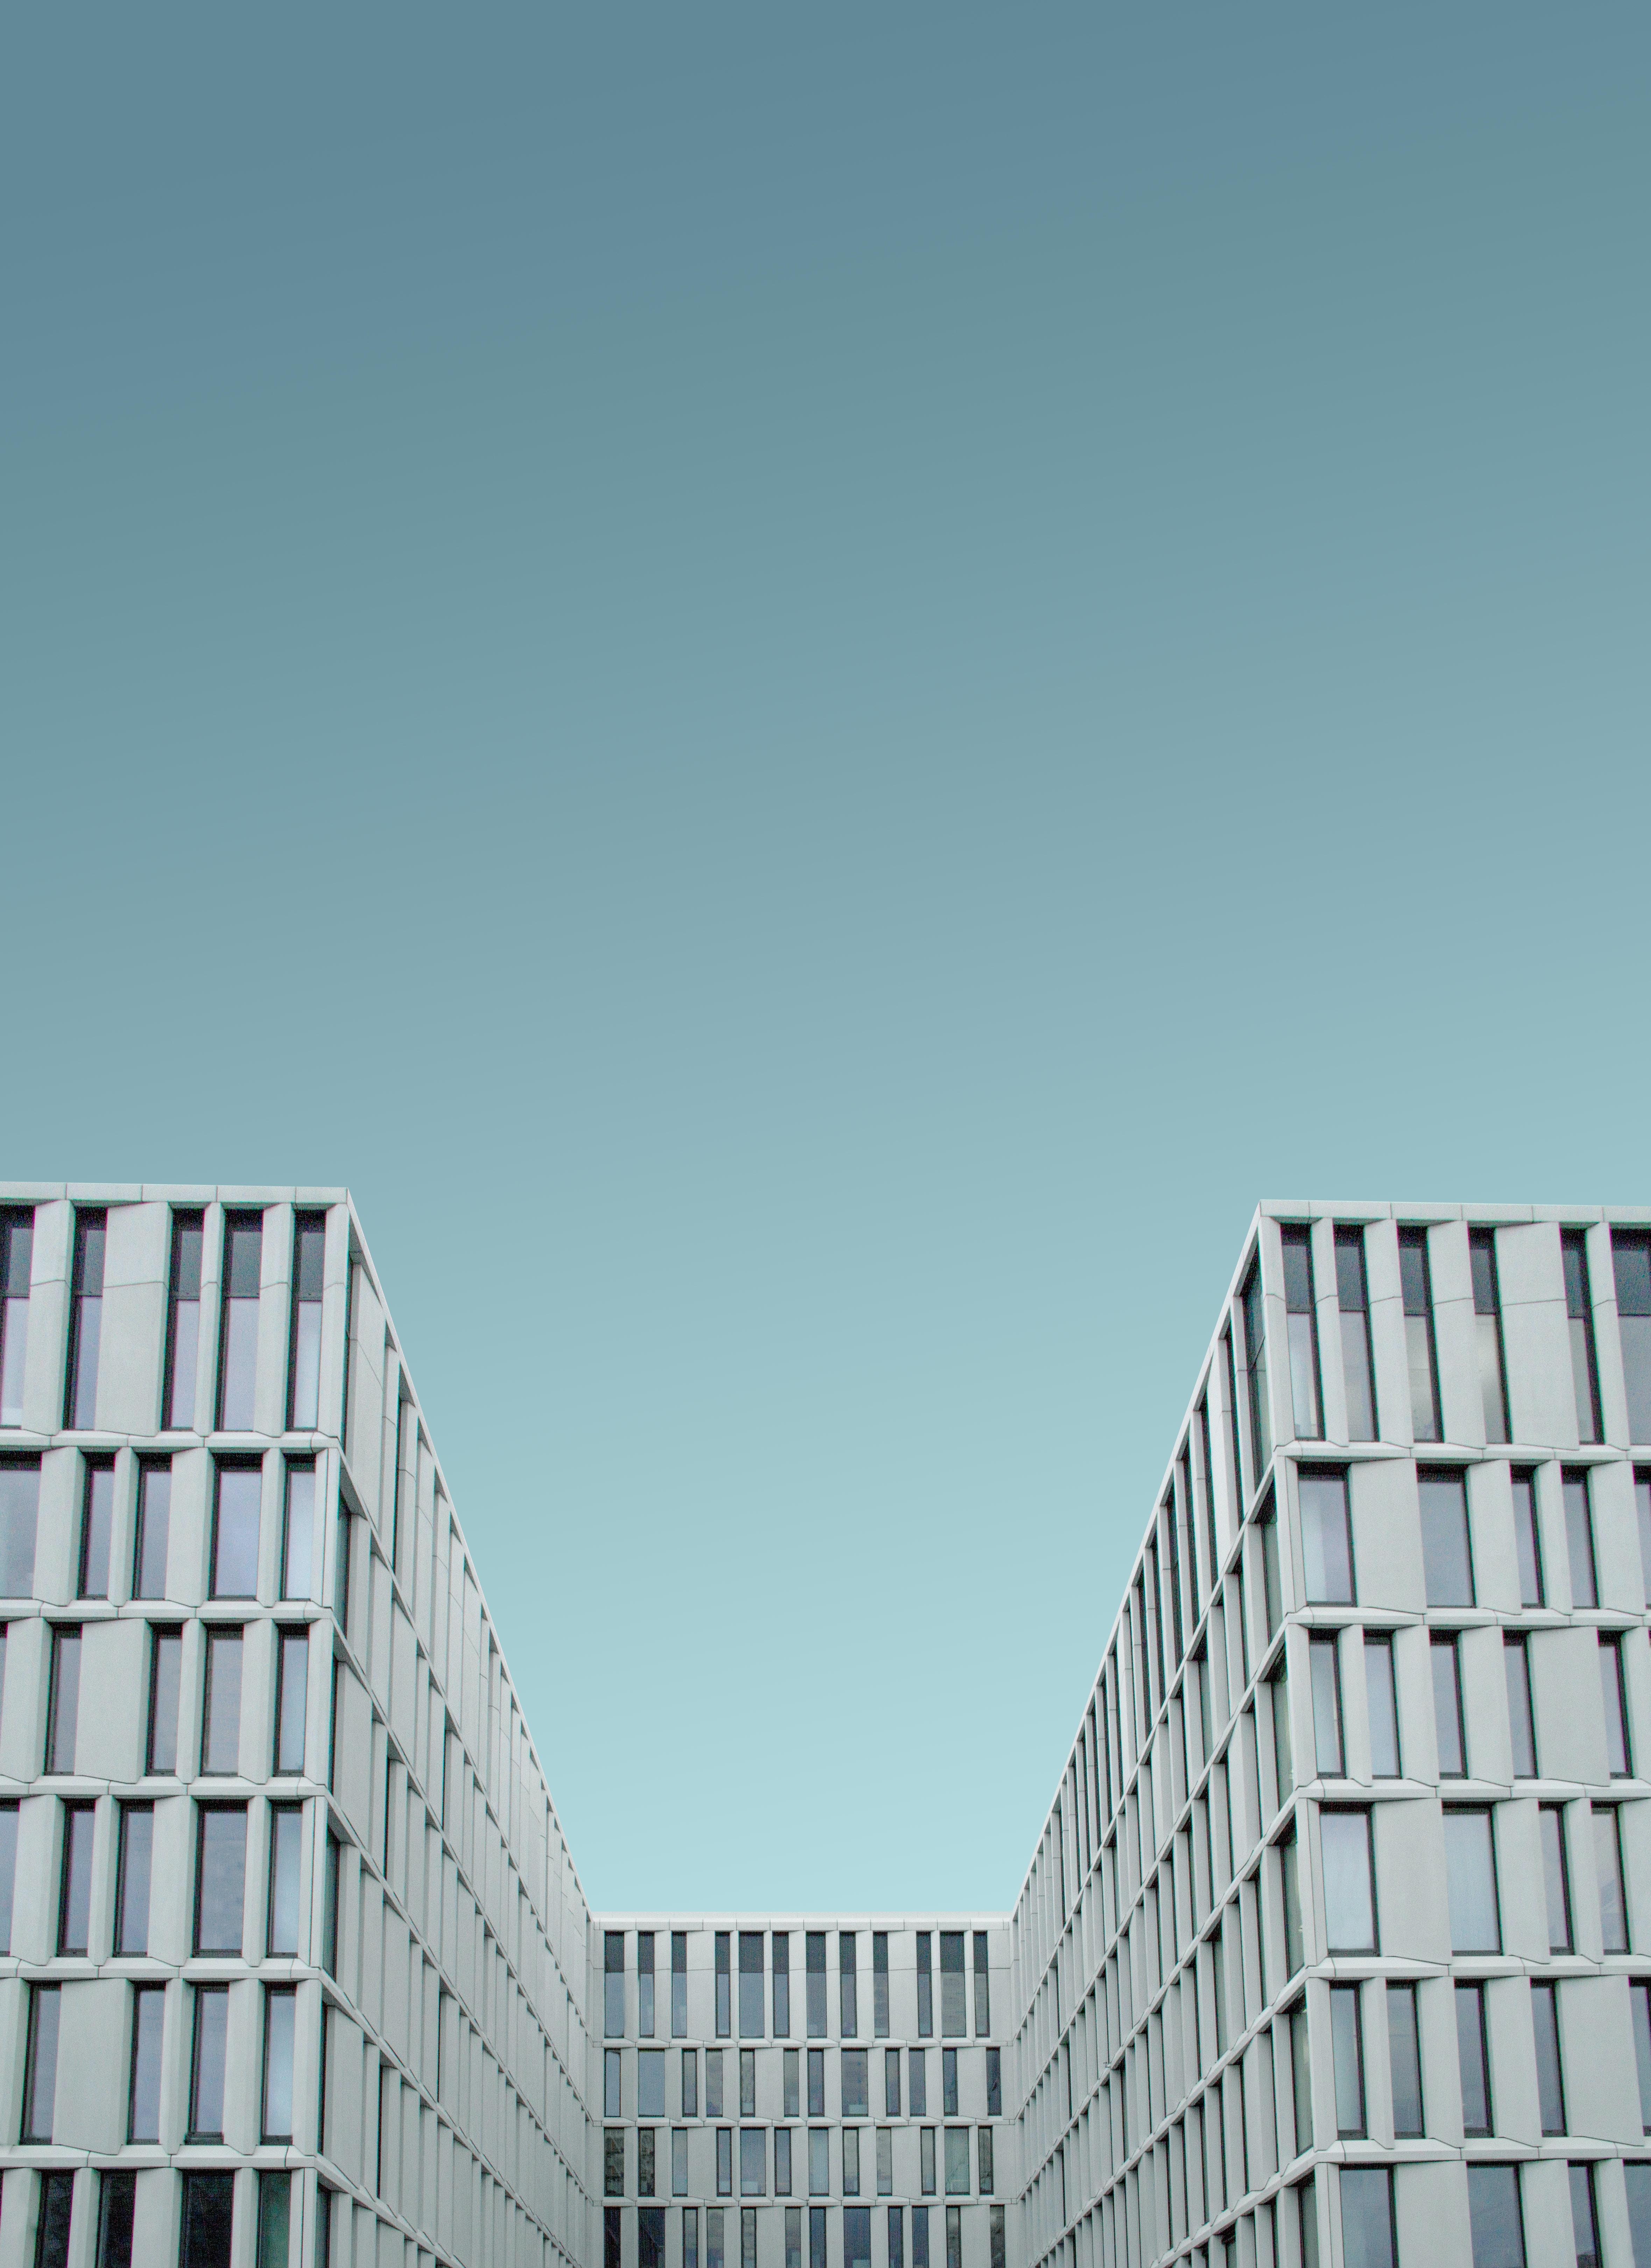 man's eye view of white quadrangle building